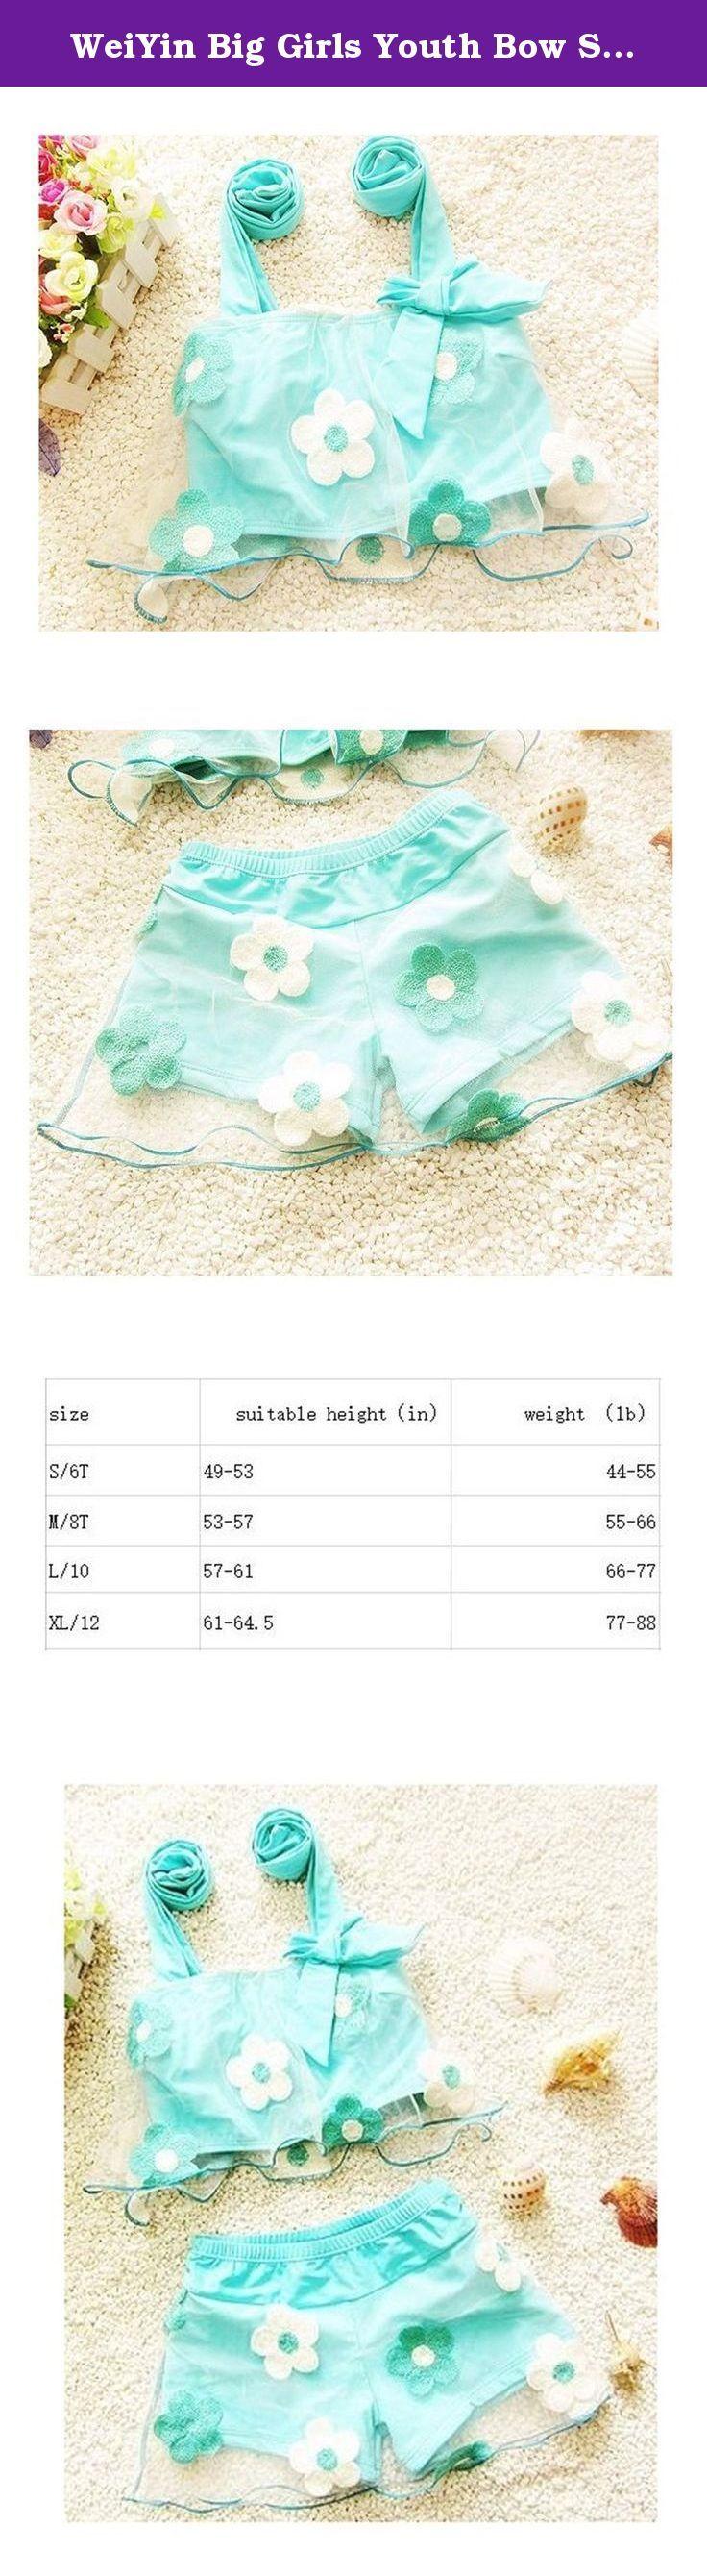 WeiYin Big Girls Youth Bow Swimsuit Summer Beach Wear With Short L Blue. WeiYin Summer Cute Bikini Swimsuit For Girls.